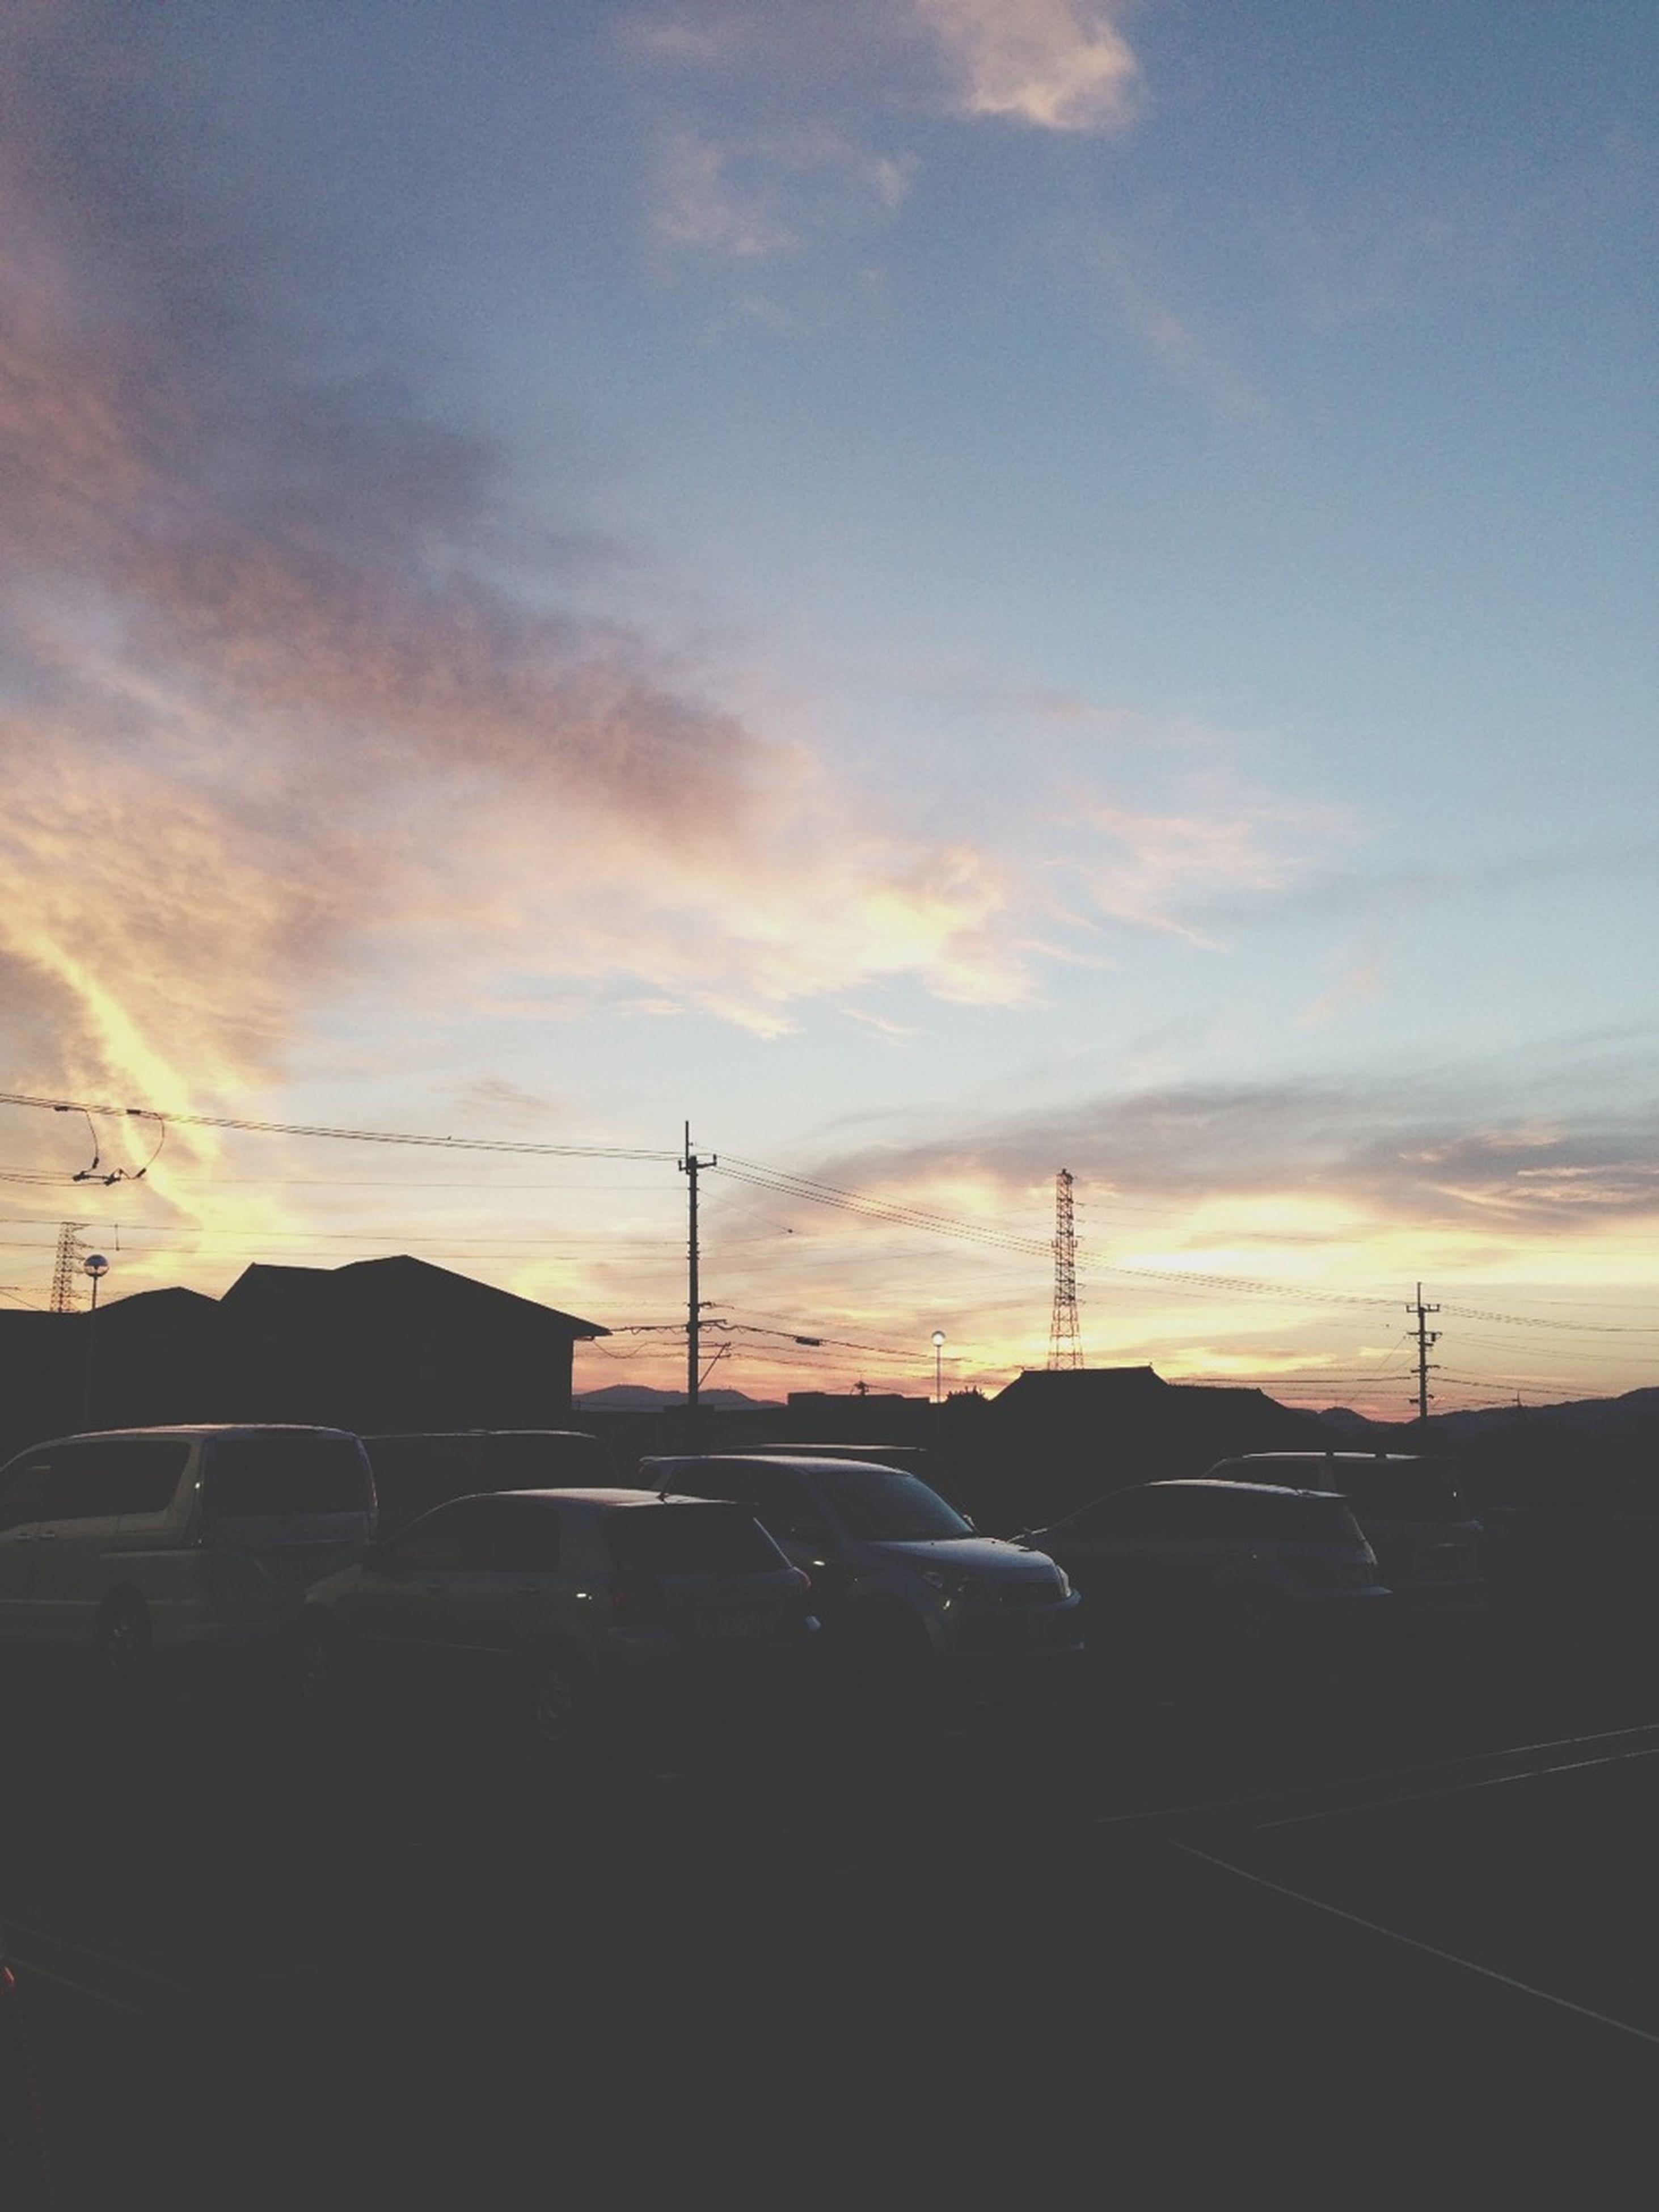 sunset, transportation, car, sky, land vehicle, mode of transport, silhouette, street light, road, cloud - sky, building exterior, electricity pylon, street, built structure, power line, orange color, architecture, cloud, outdoors, city